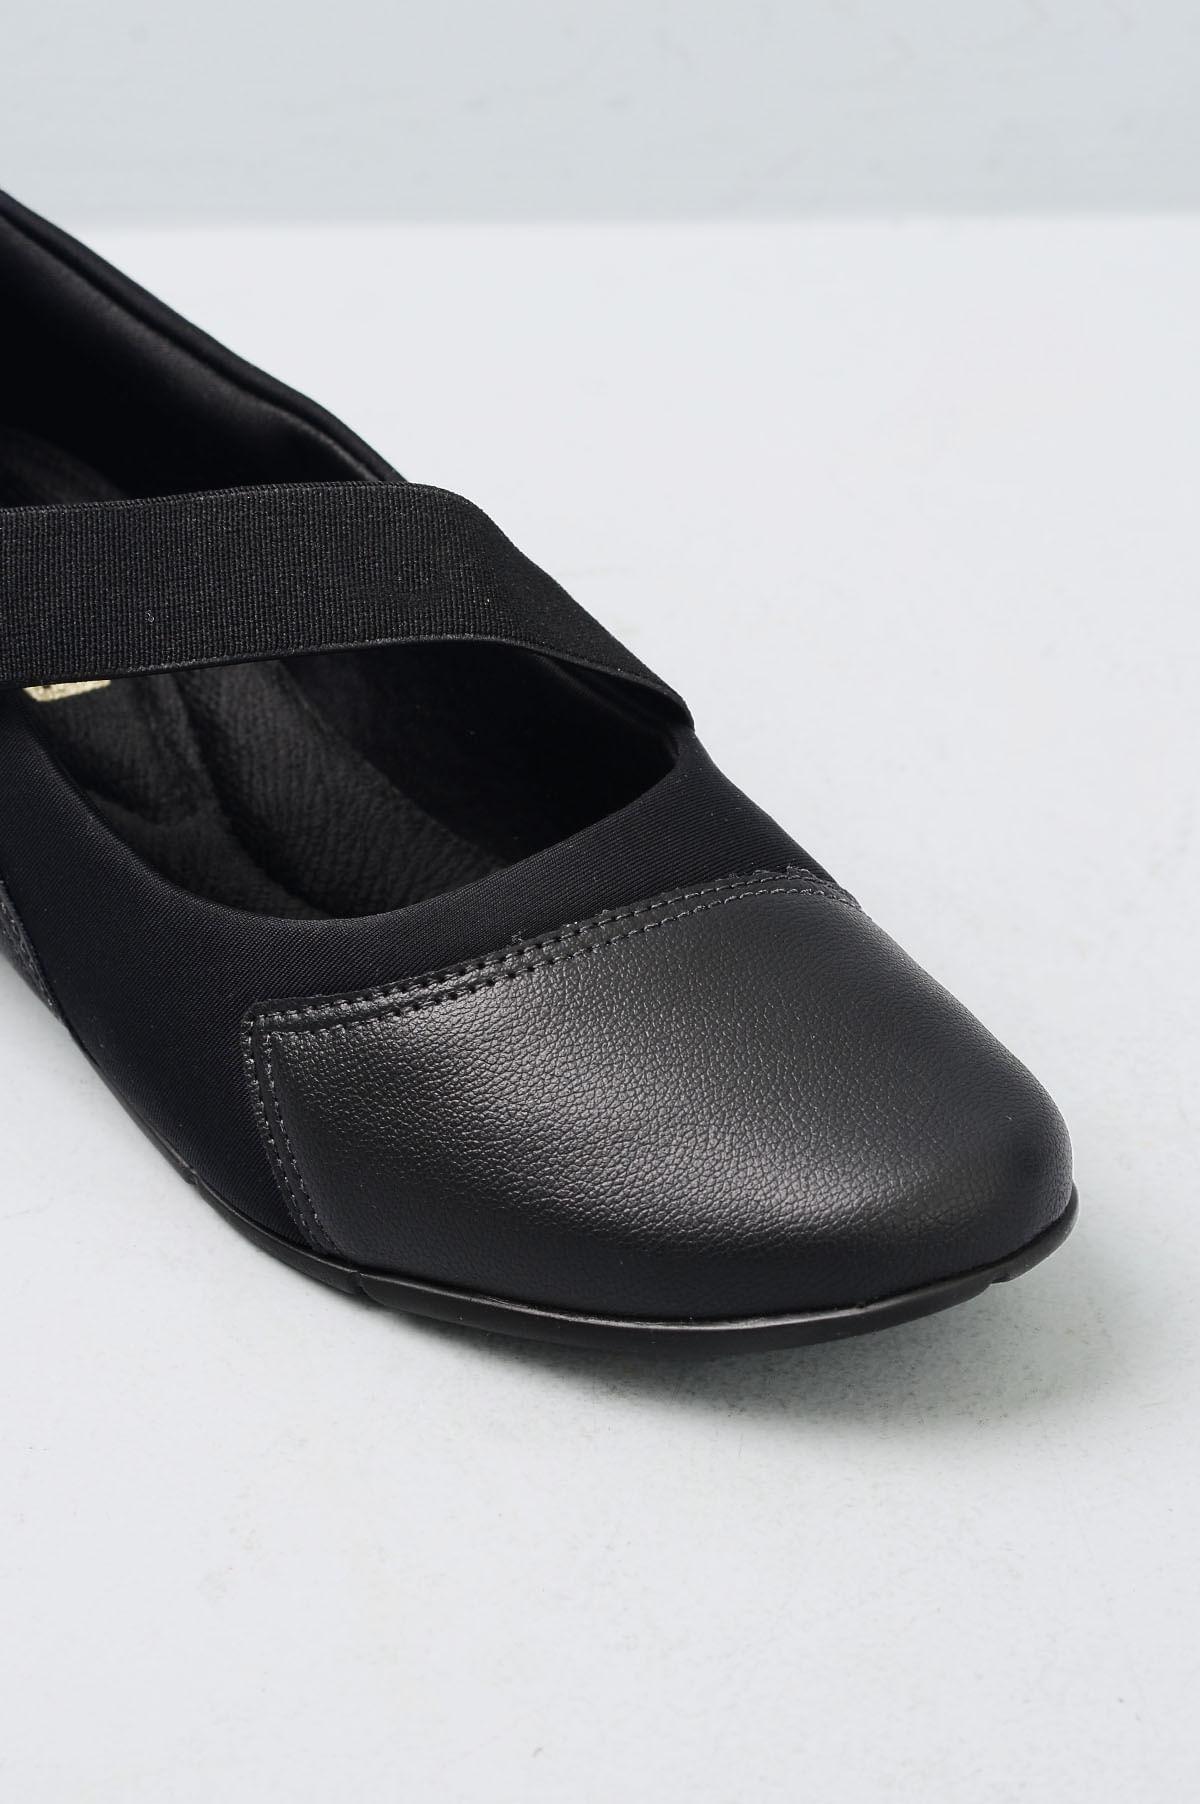 c672b30be Sapato Feminino Ultrasoft Comfort Flex SINT - PRETO - Mundial Calçados